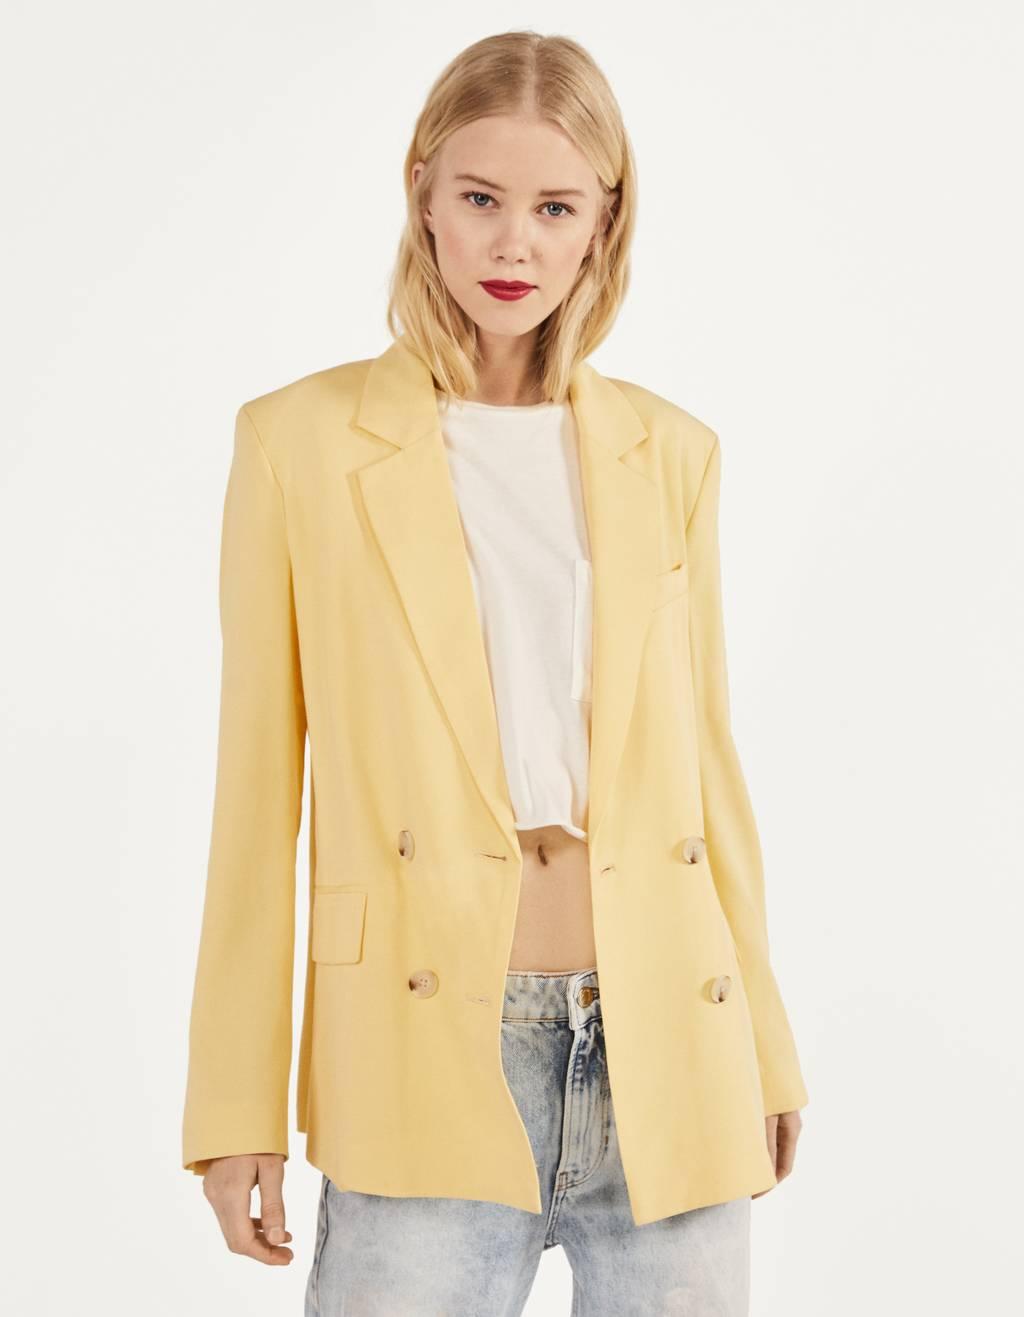 Straight-cut blazer